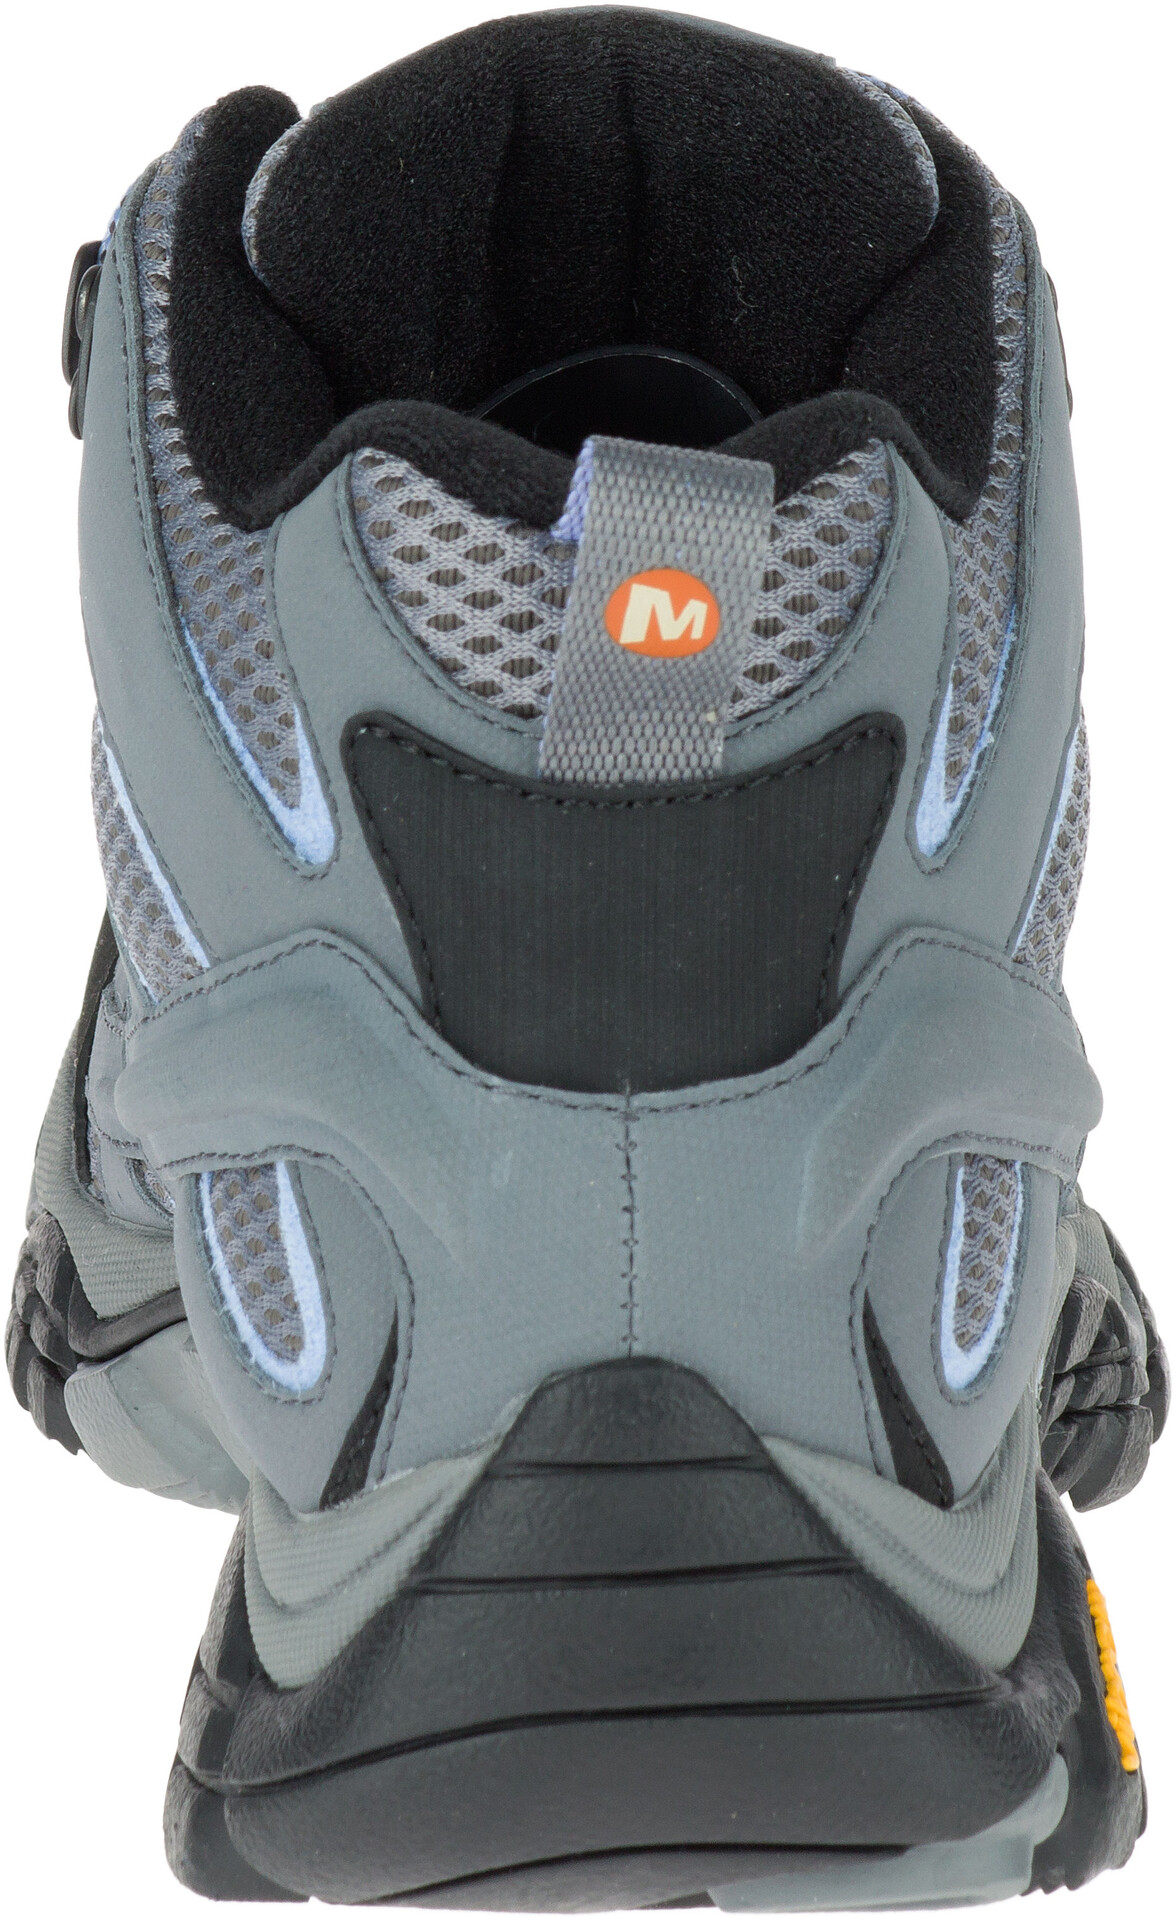 Grisbleu Sur Chaussures Mid Merrell Femme Gtx 2 Moab Campz xwqxPYp0